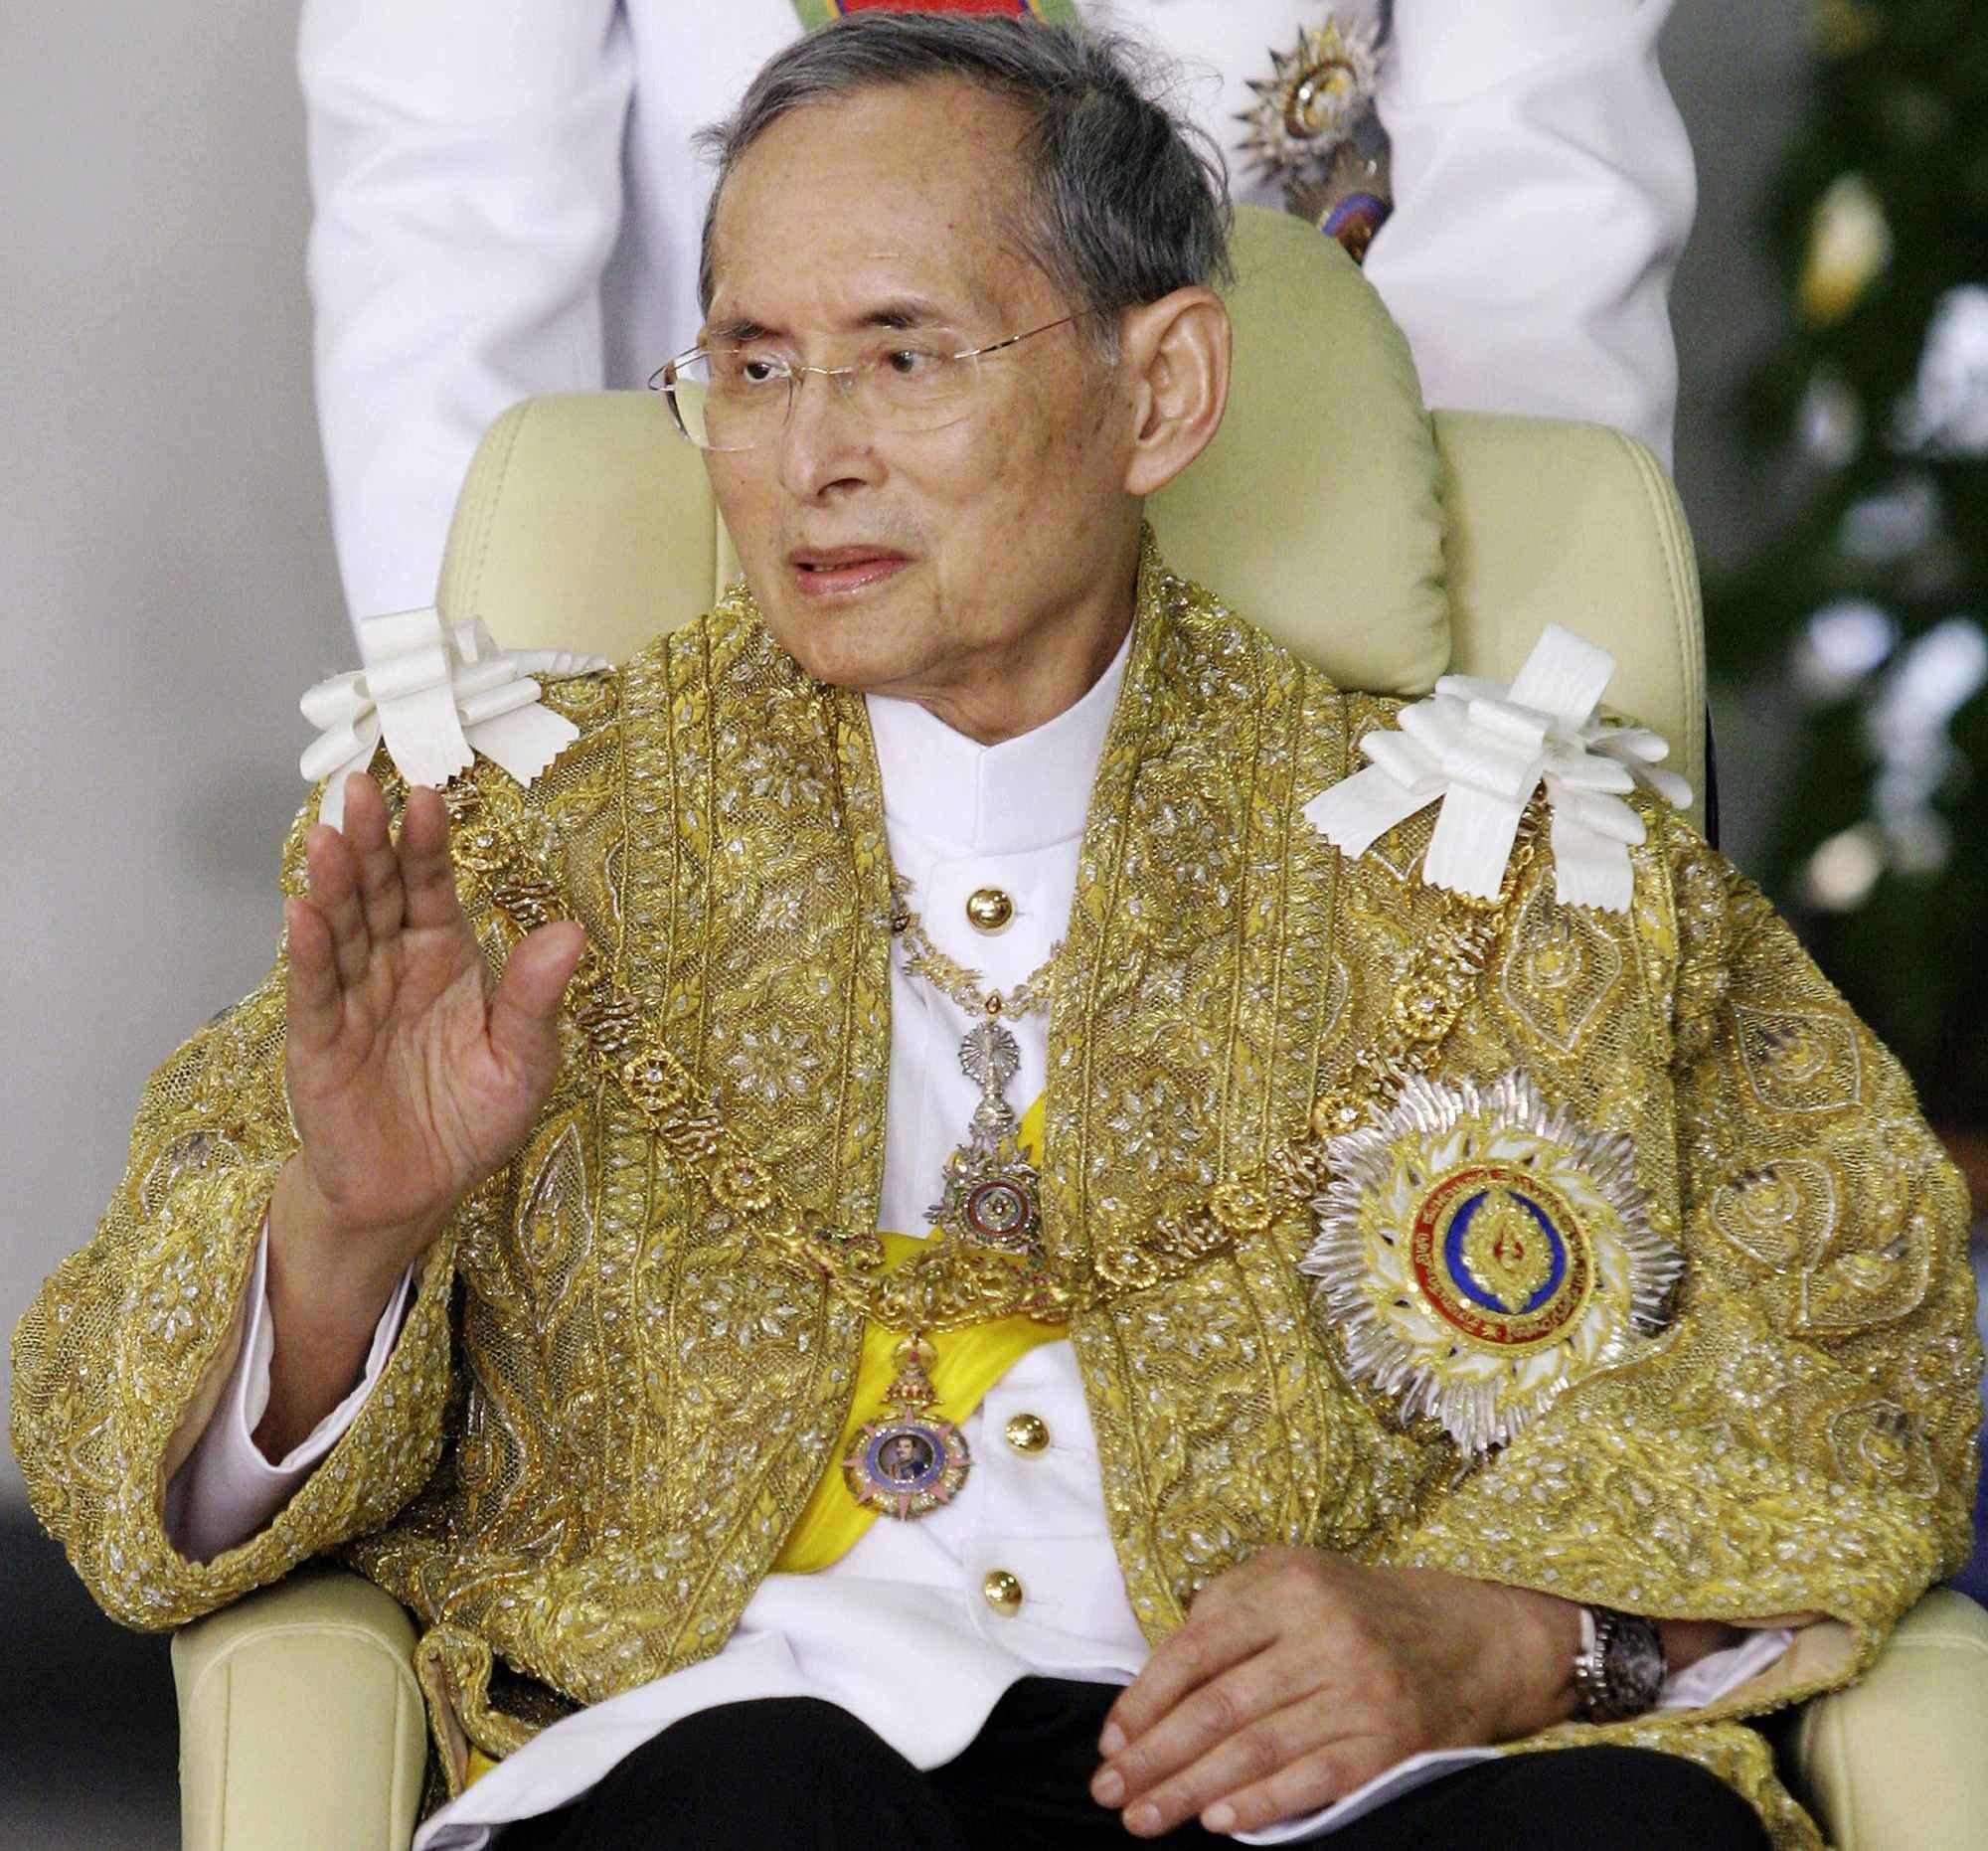 картинка короля таиланда несколько дней